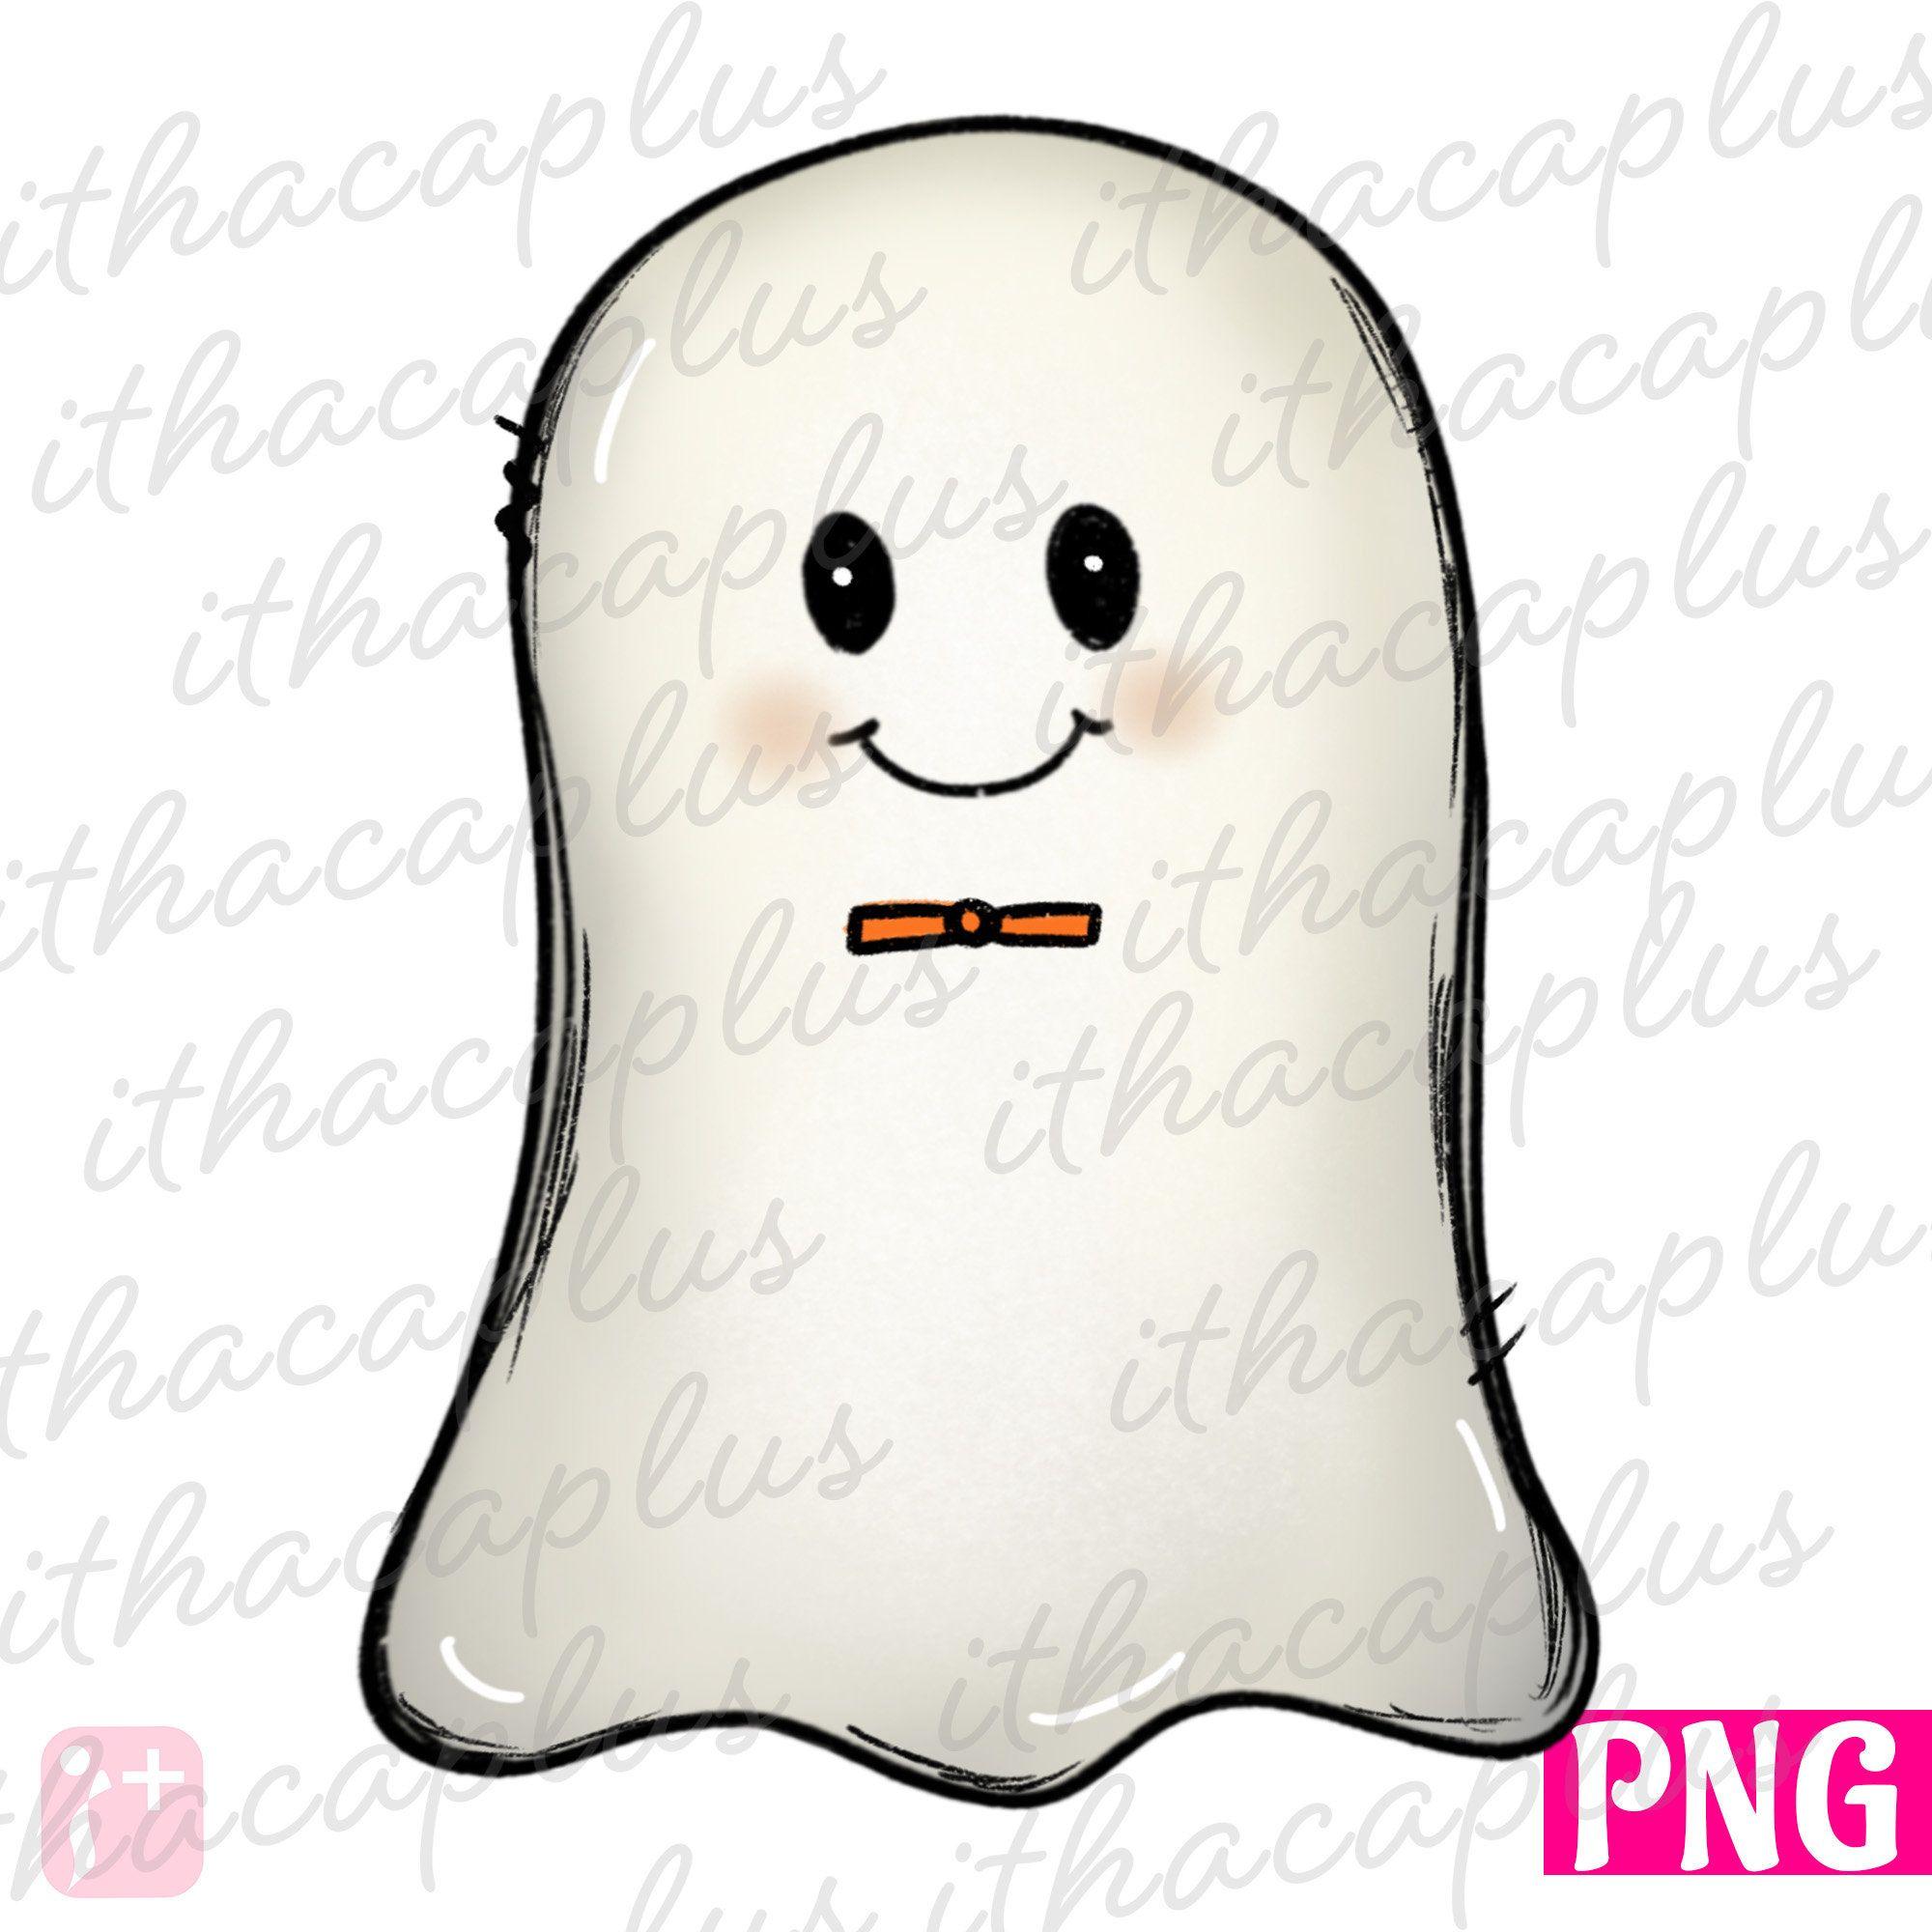 Halloween Png Halloween Sublimation Design Halloween Etsy Halloween Digital Halloween Design Halloween